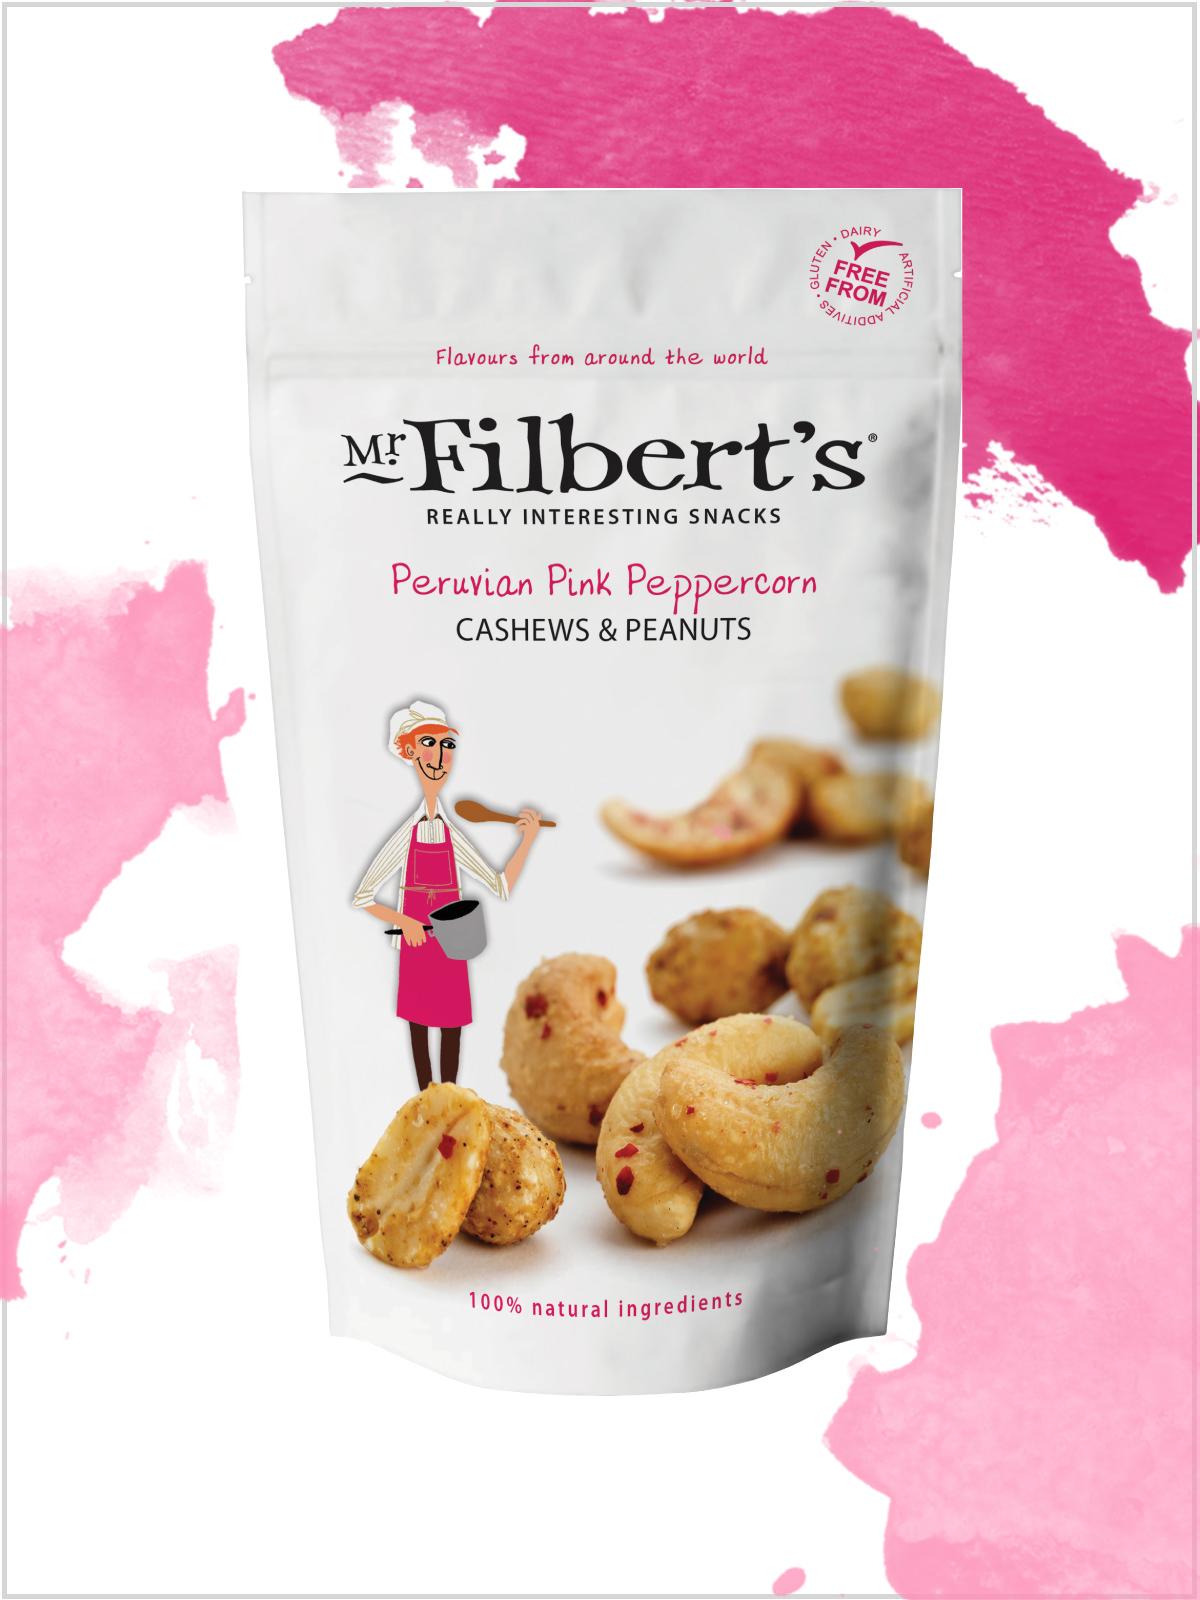 frederickandsophie-gourmet-mr_filberts-peruvian-pink-peppercorn-nuts